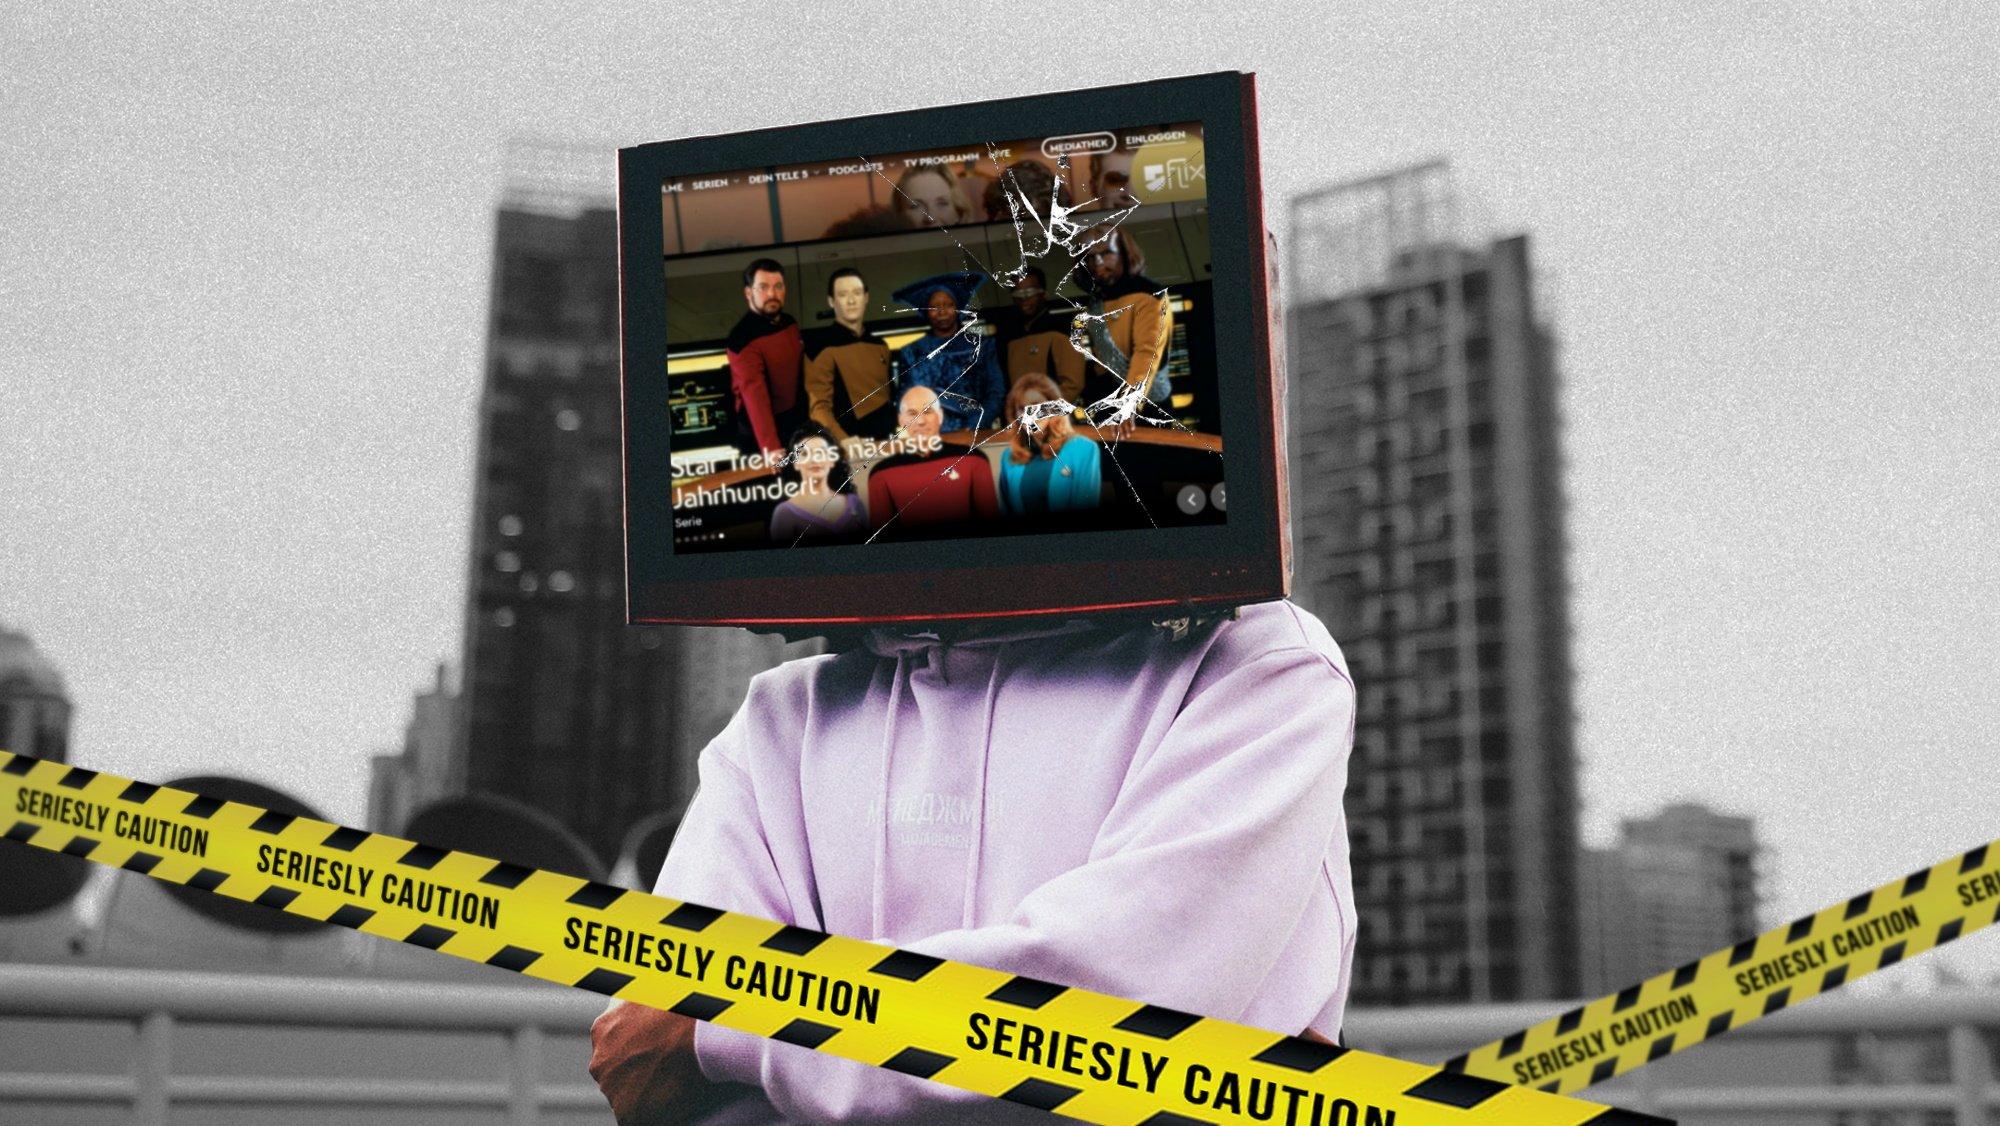 TV-Aufreger Mediatheken